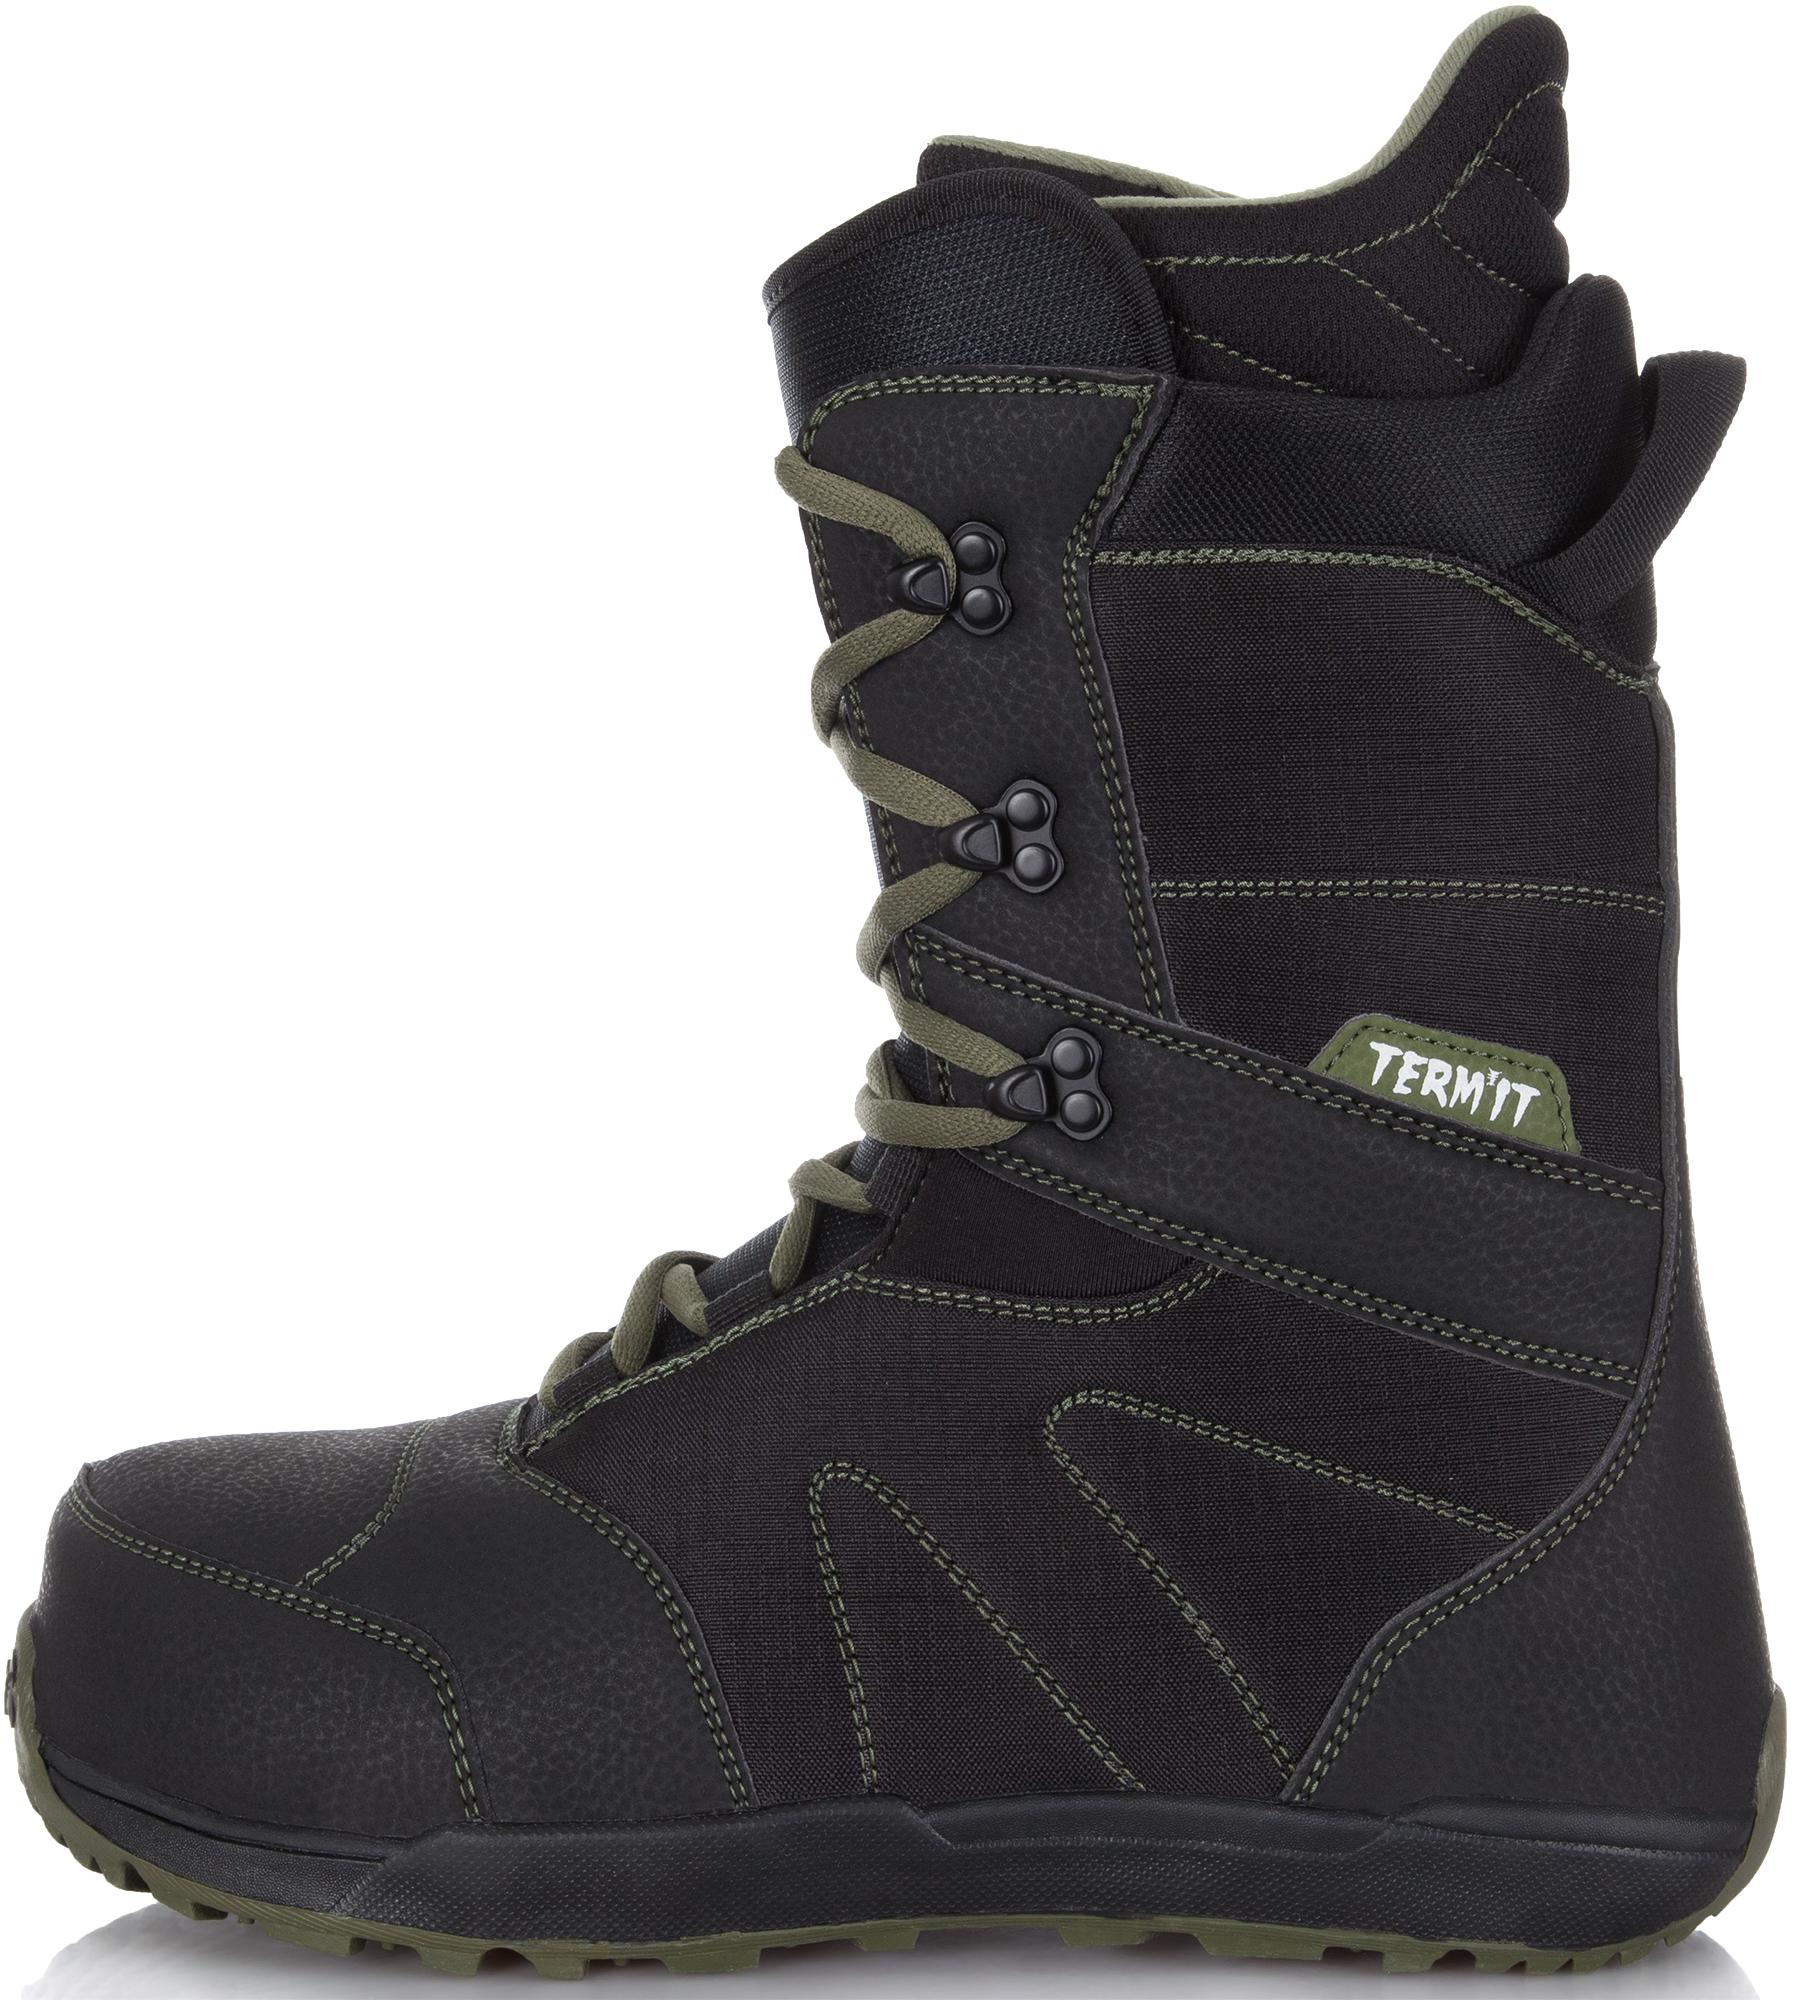 Termit Сноубордические ботинки Termit Symbol, размер 42,5 сноубордические ботинки black fire splady 16 17 splady размер 37